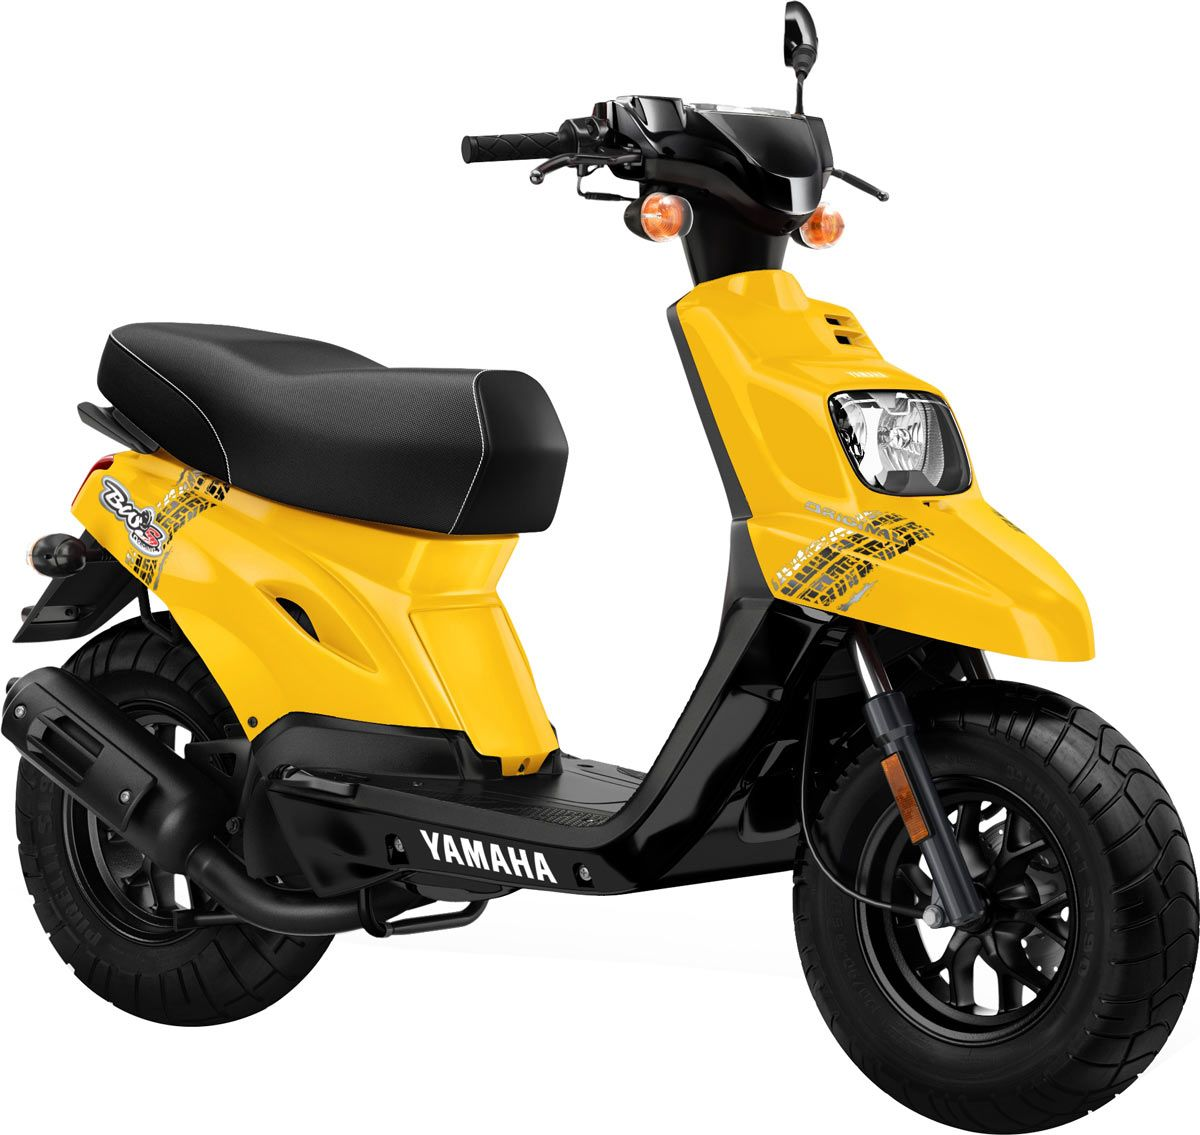 Yamaha présentation des Bw's et Aerox 2016 Motor